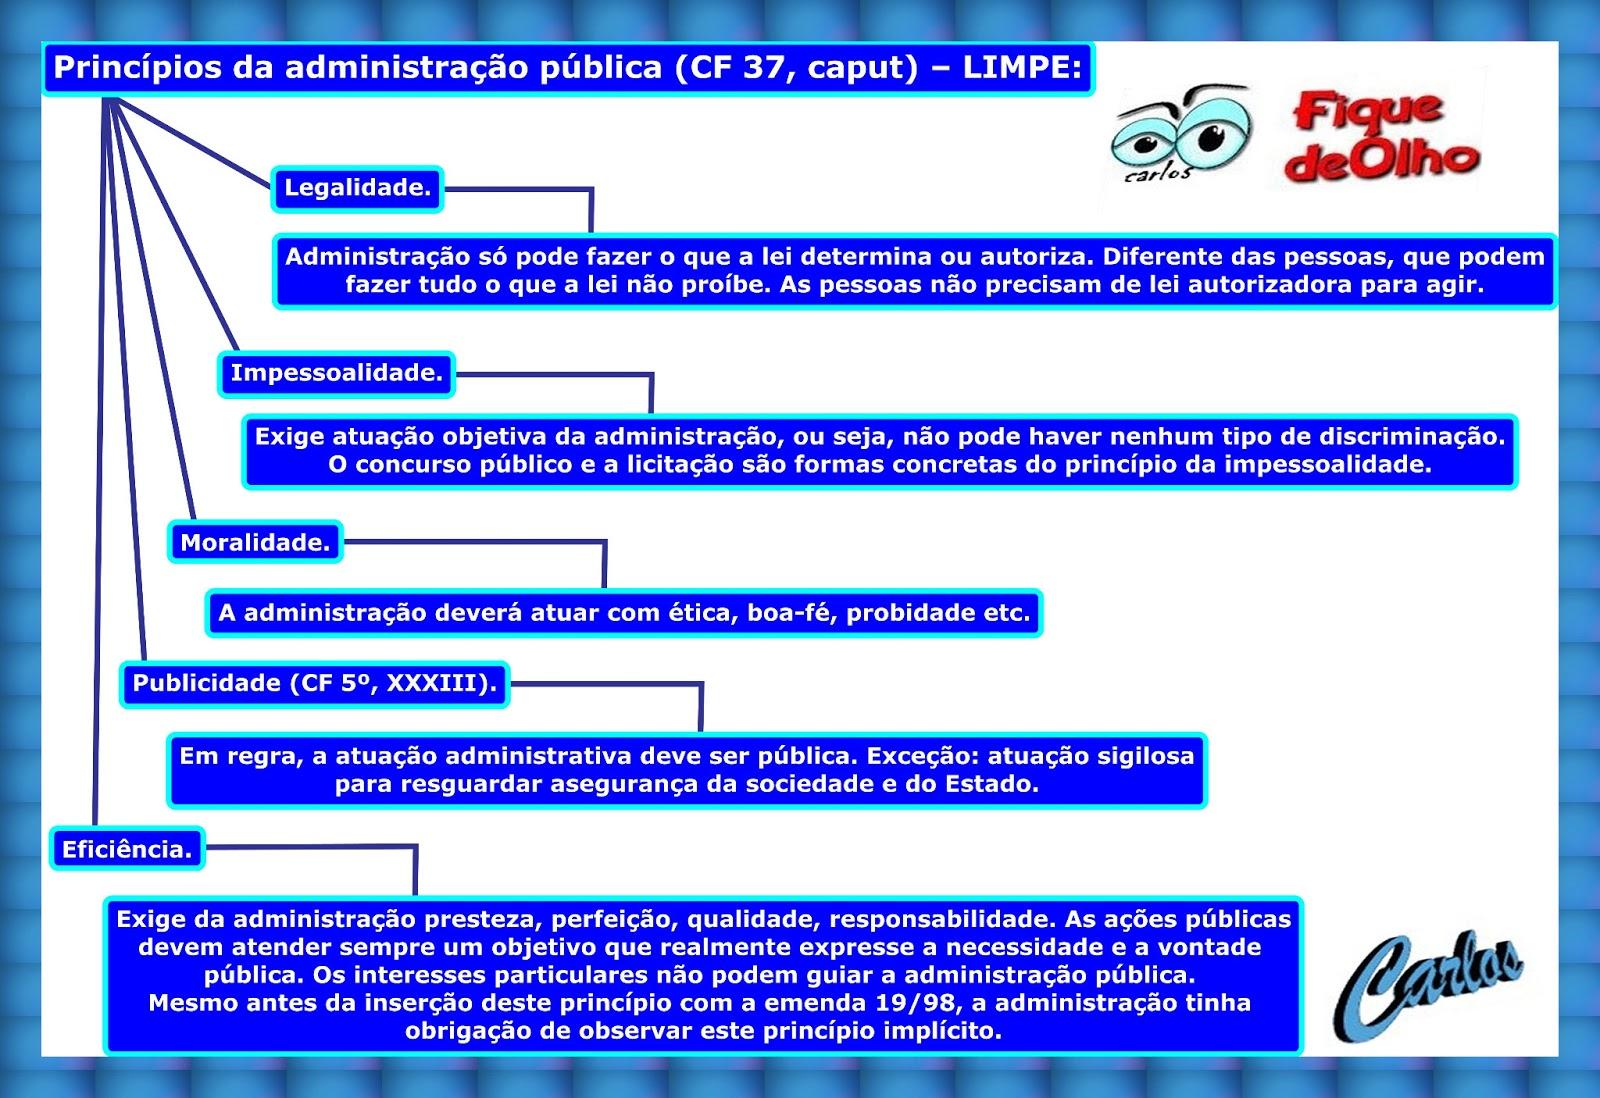 Princípios da adm. pública (CF 37) – LIMPE